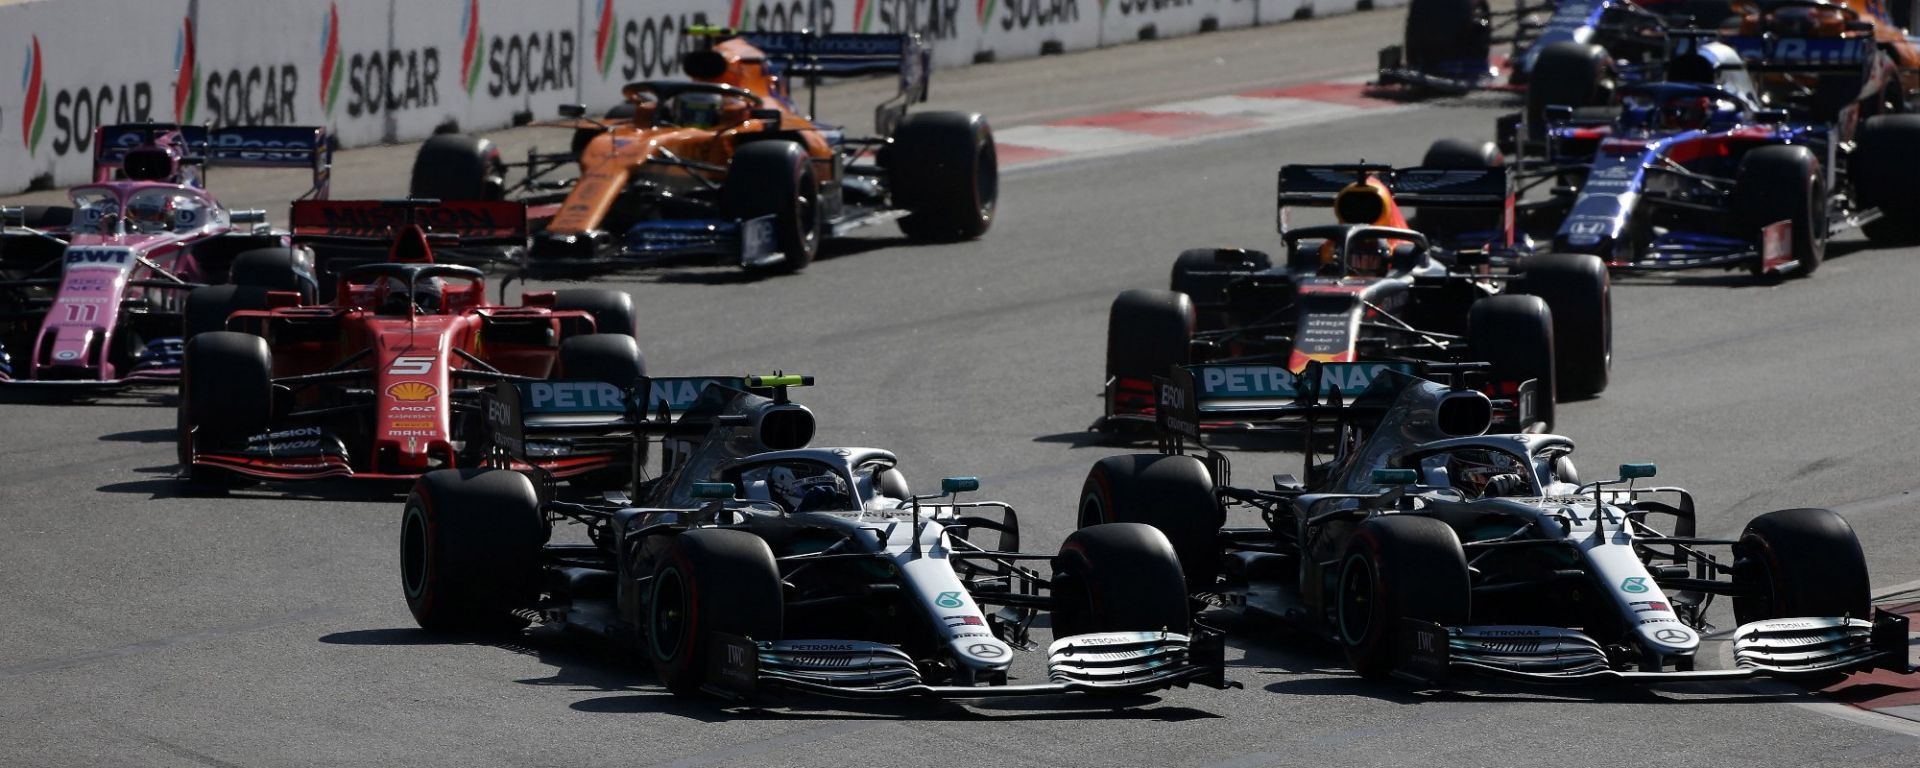 F1 GP Azerbaijan 2019, le pagelle di Baku